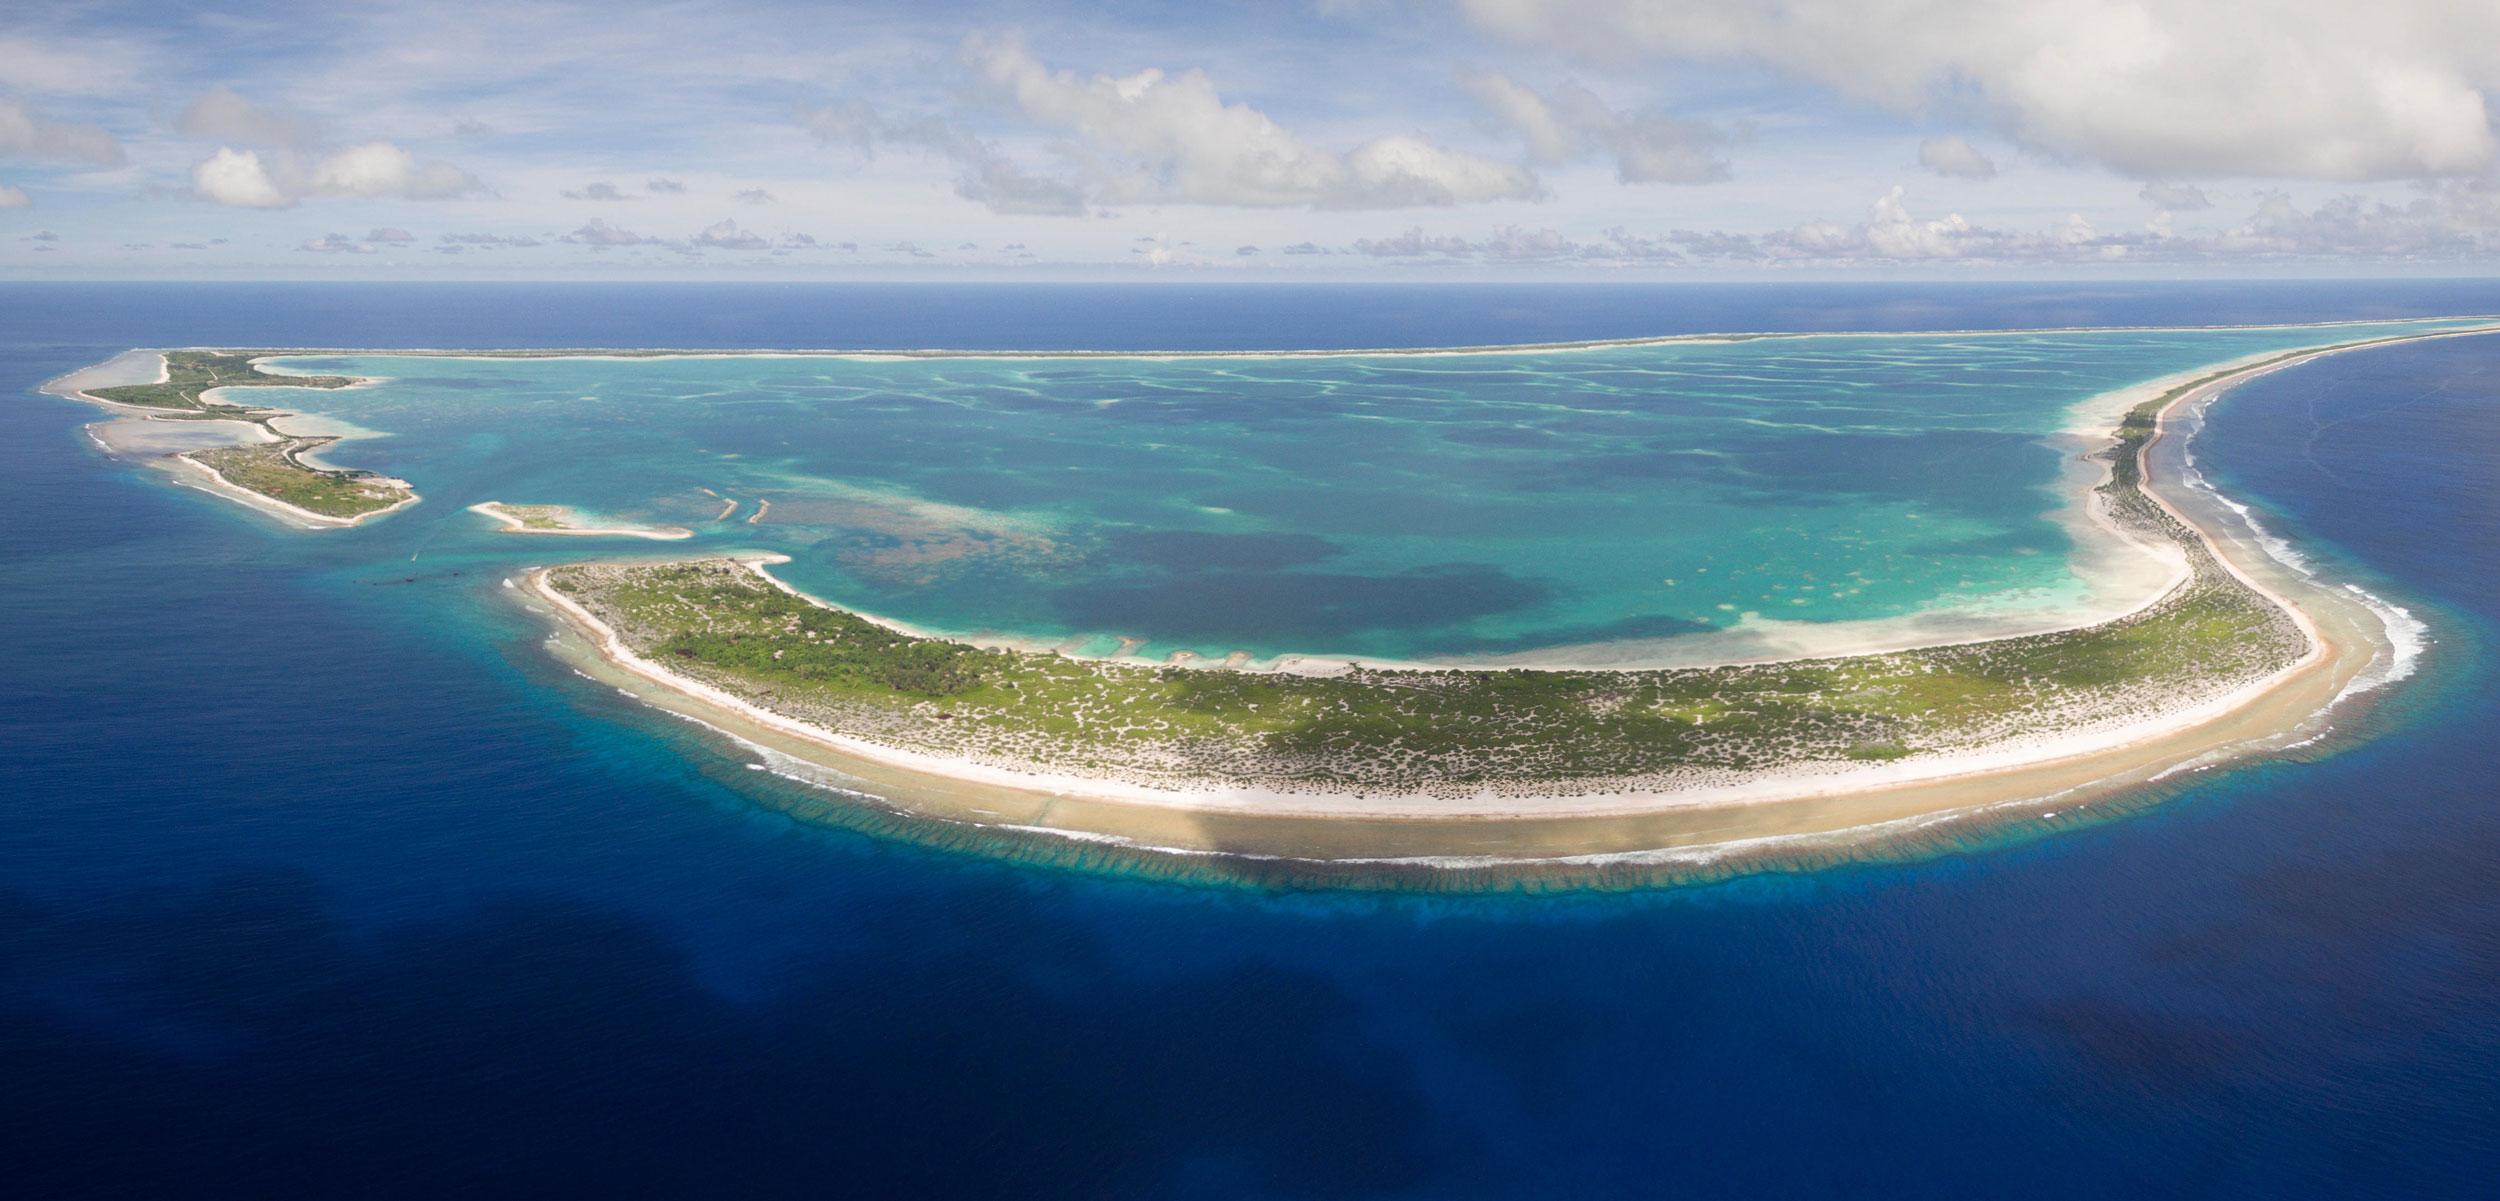 Kanton Island, Kiribati